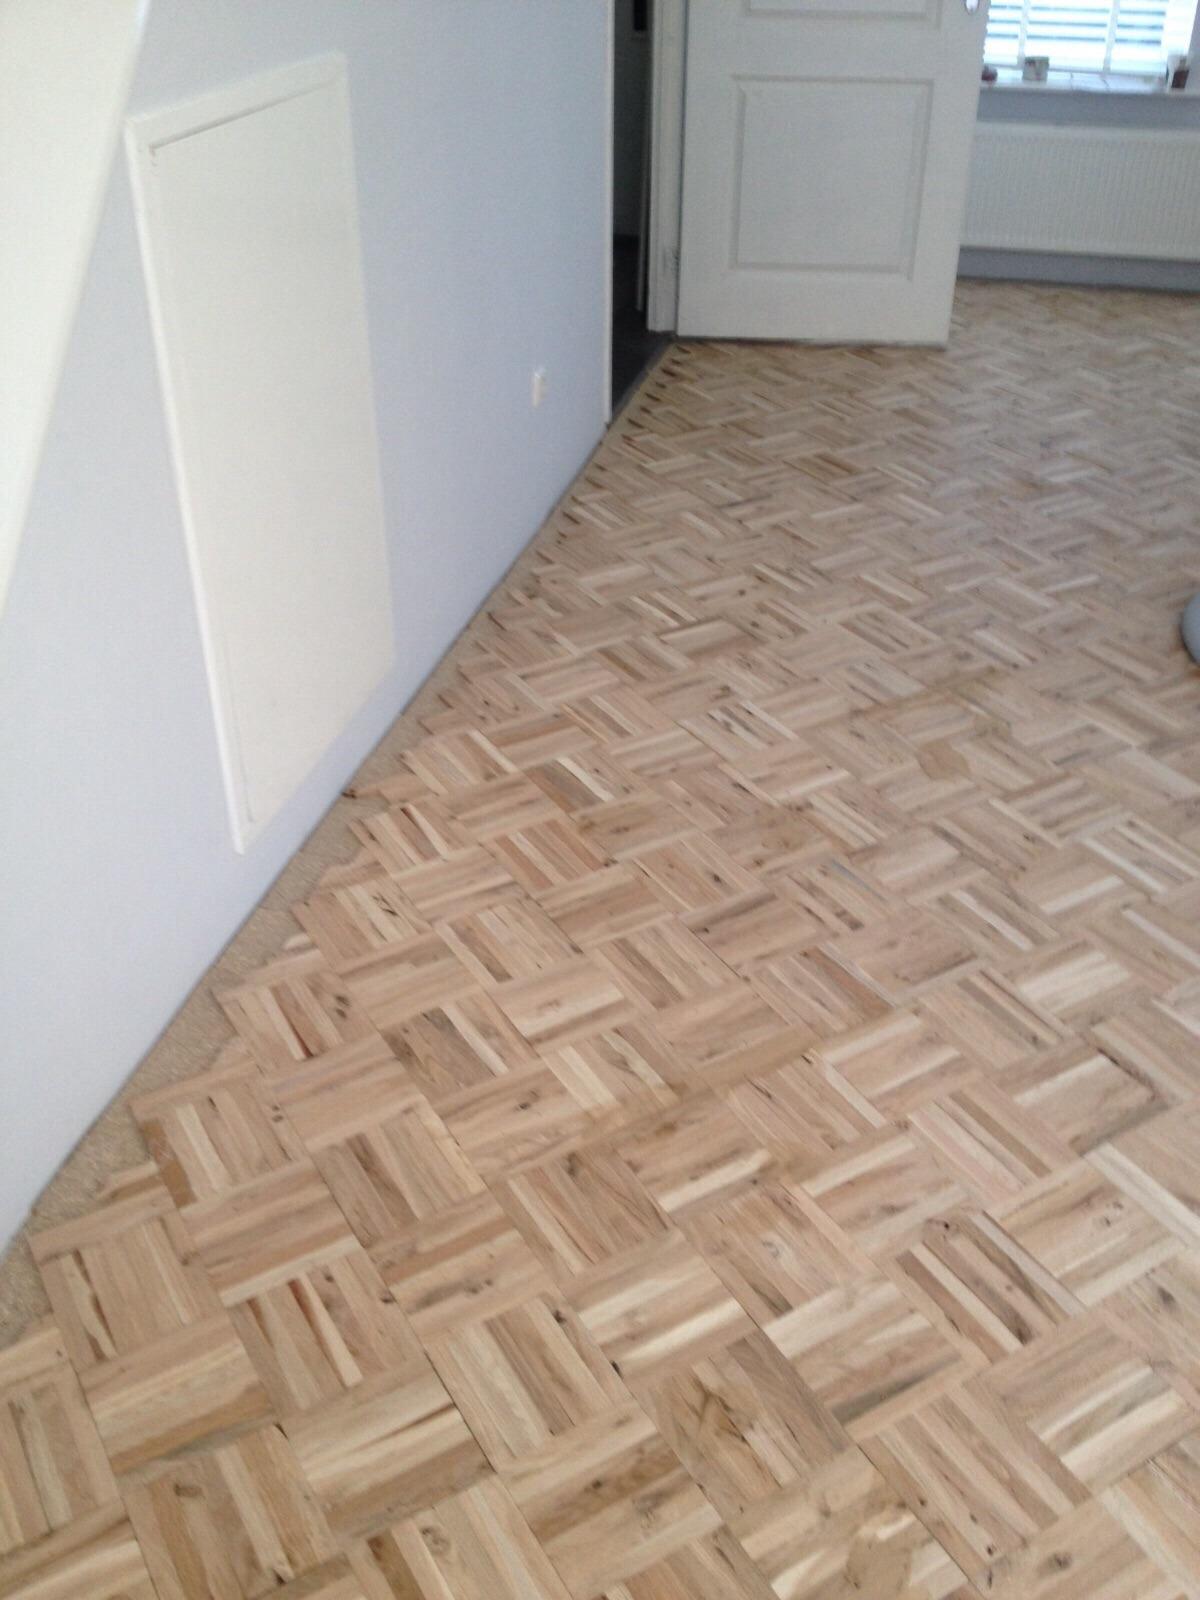 laminaat leggen op houten vloer tv vloeren houten vloeren lamel